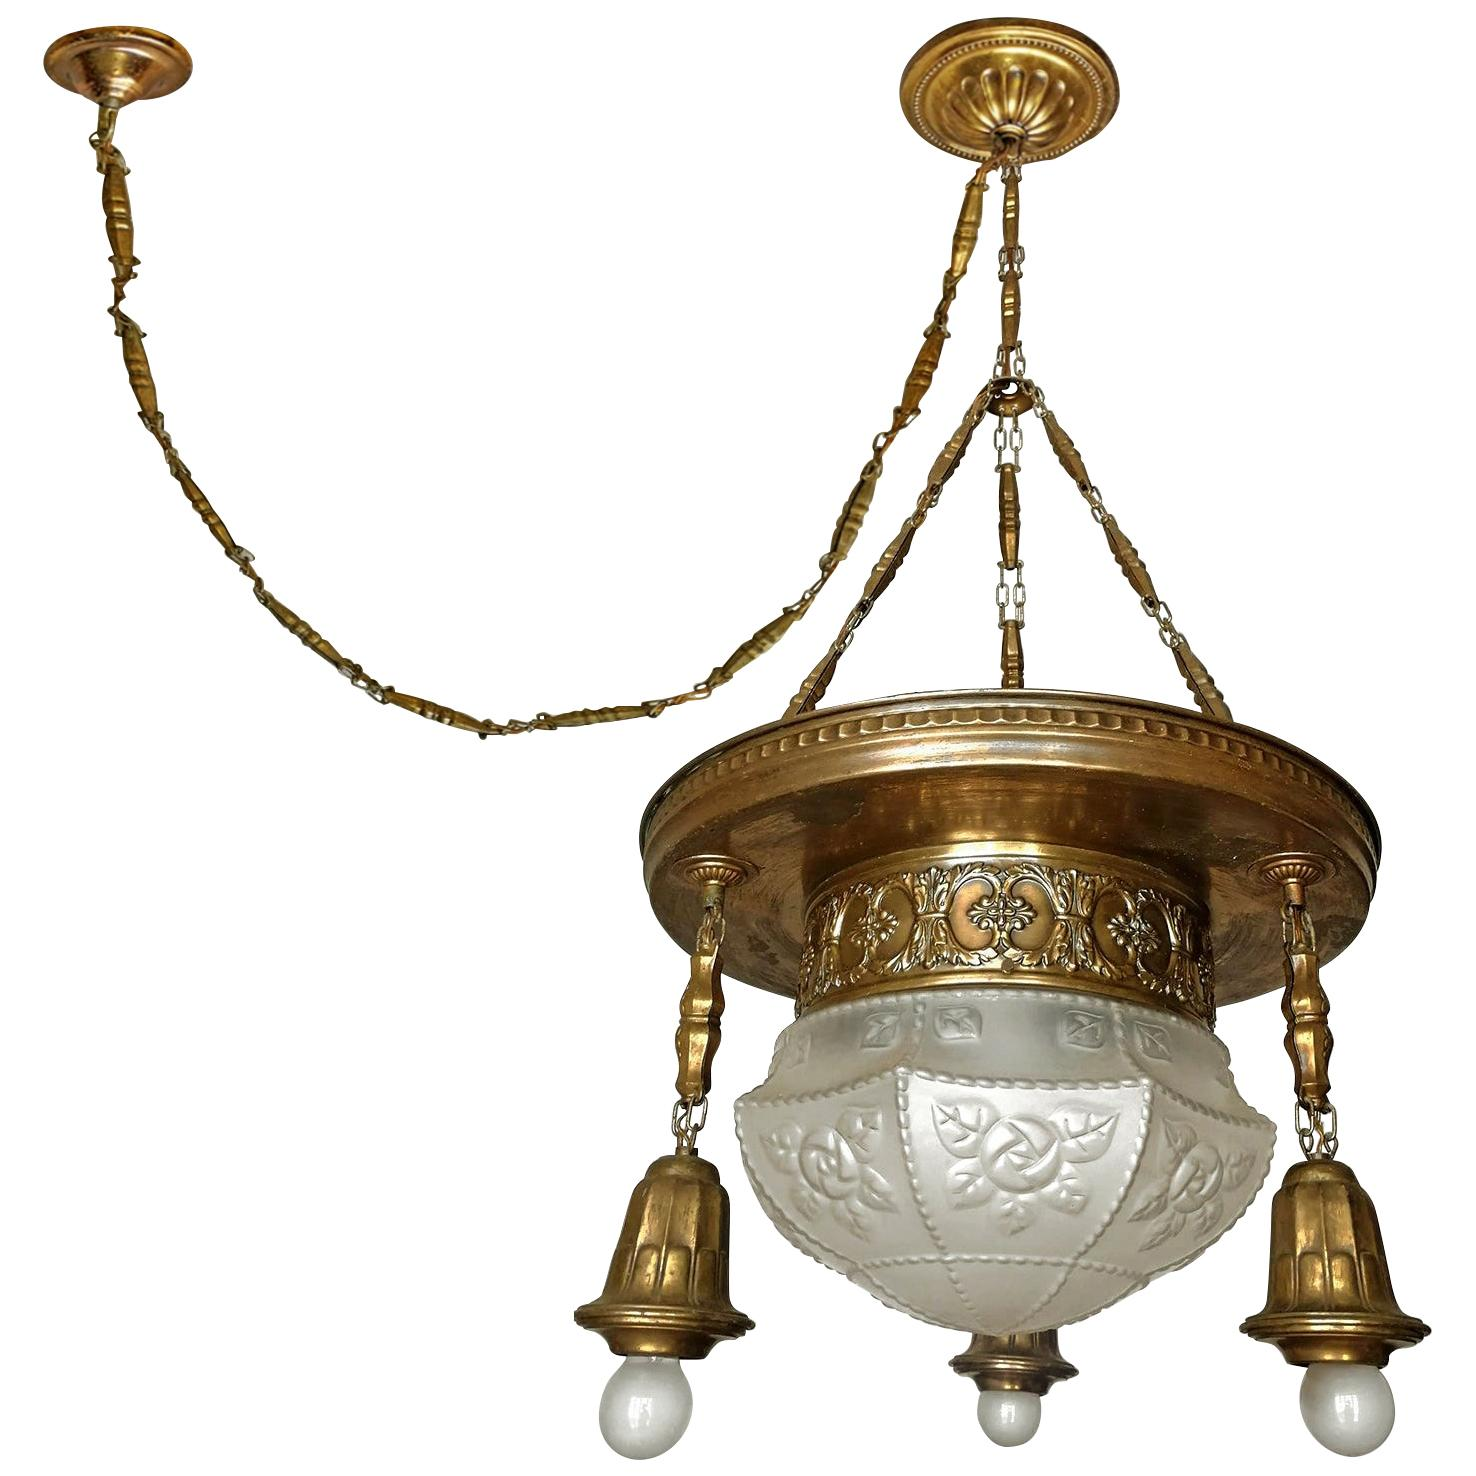 French Art Deco & Art Nouveau Gilt Brass & Frosted Glass 4-Light Chandelier 1920